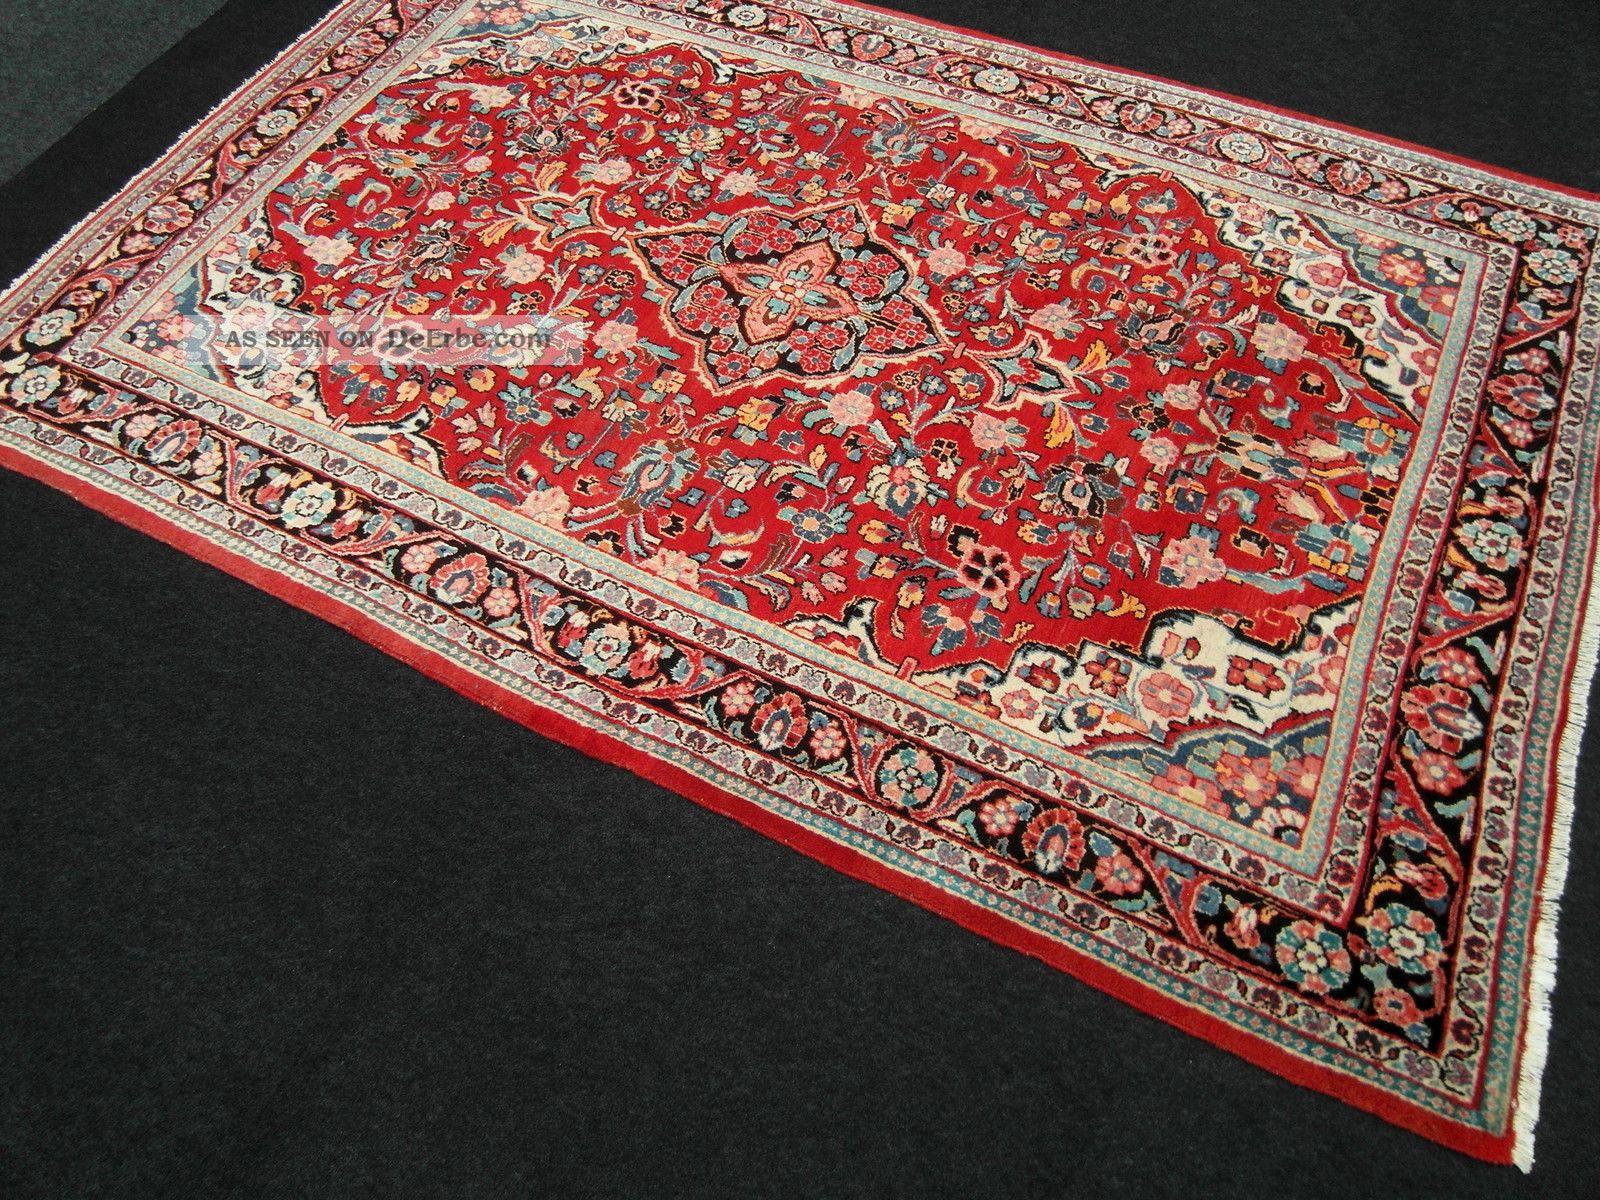 Alter orient teppich rot 324 x 213 cm perserteppich old - Tapis 200x140 ...